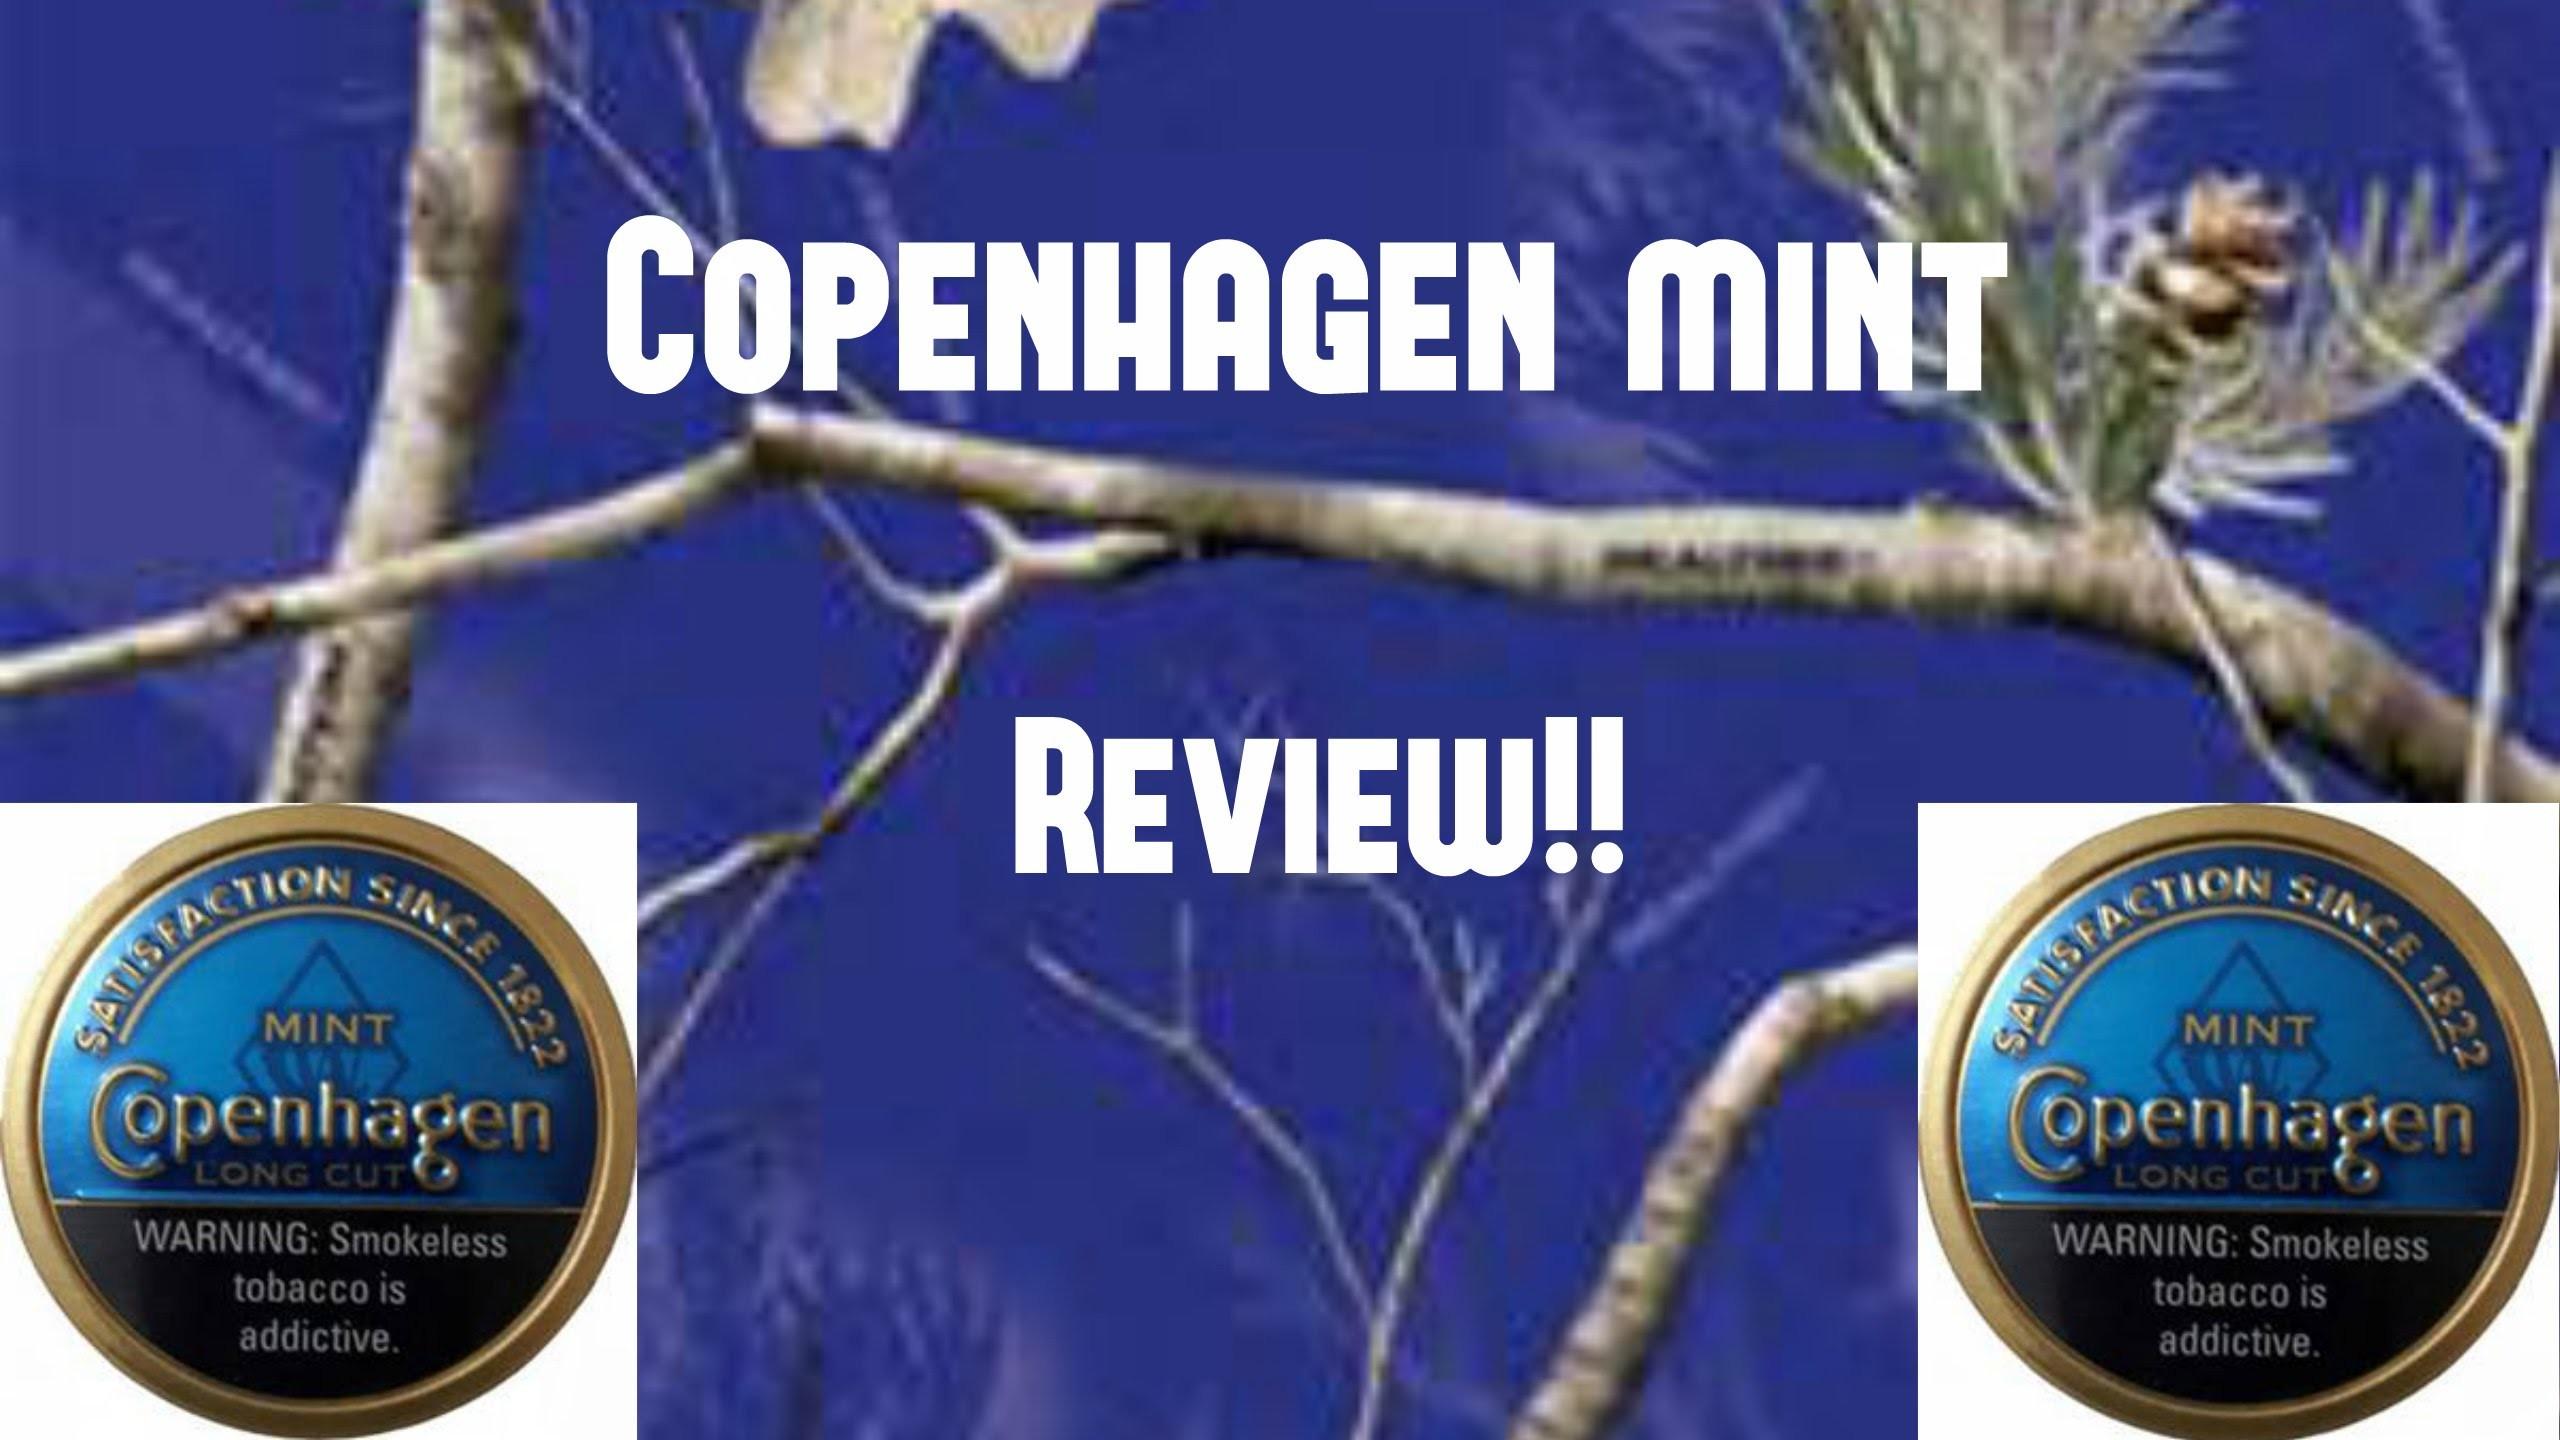 Copenhagen mint review!!